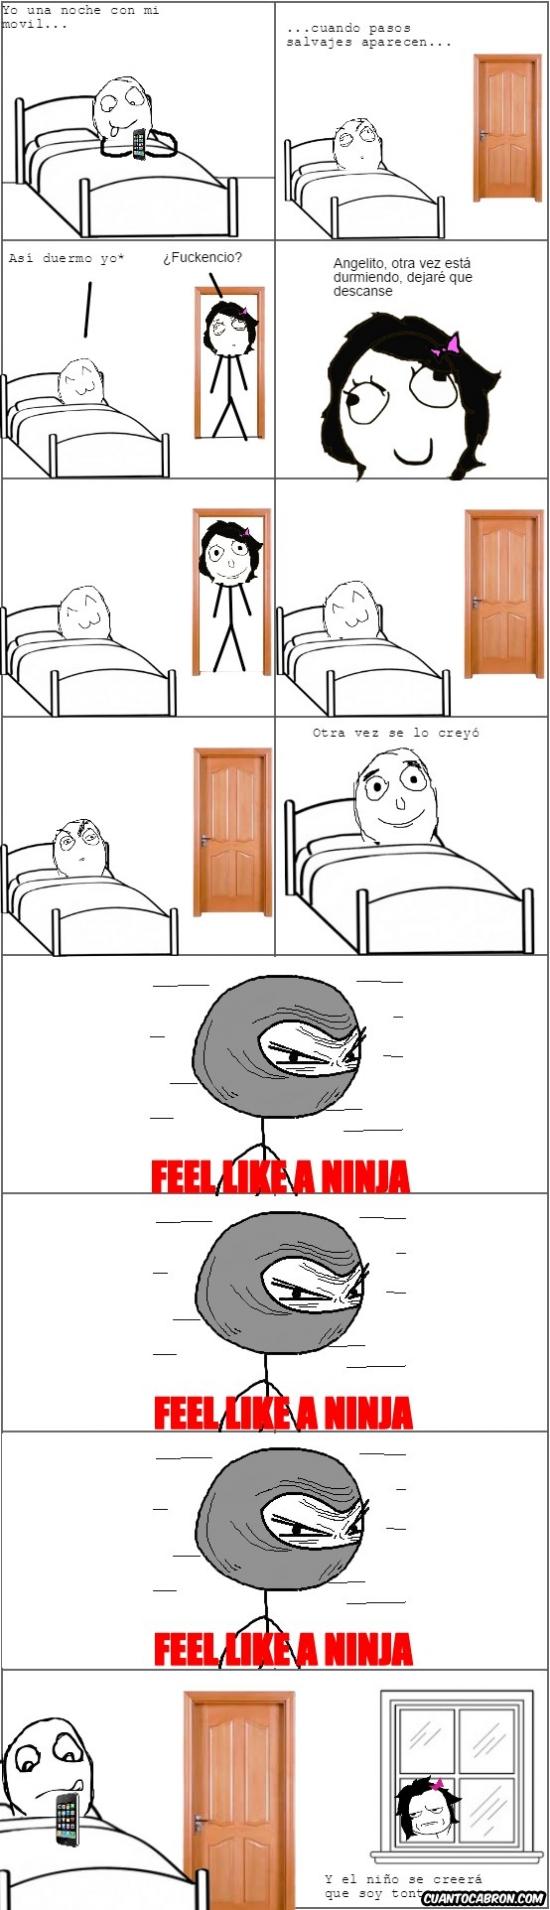 Feel like a ninja,madre,mentir,móvil. cama,noche